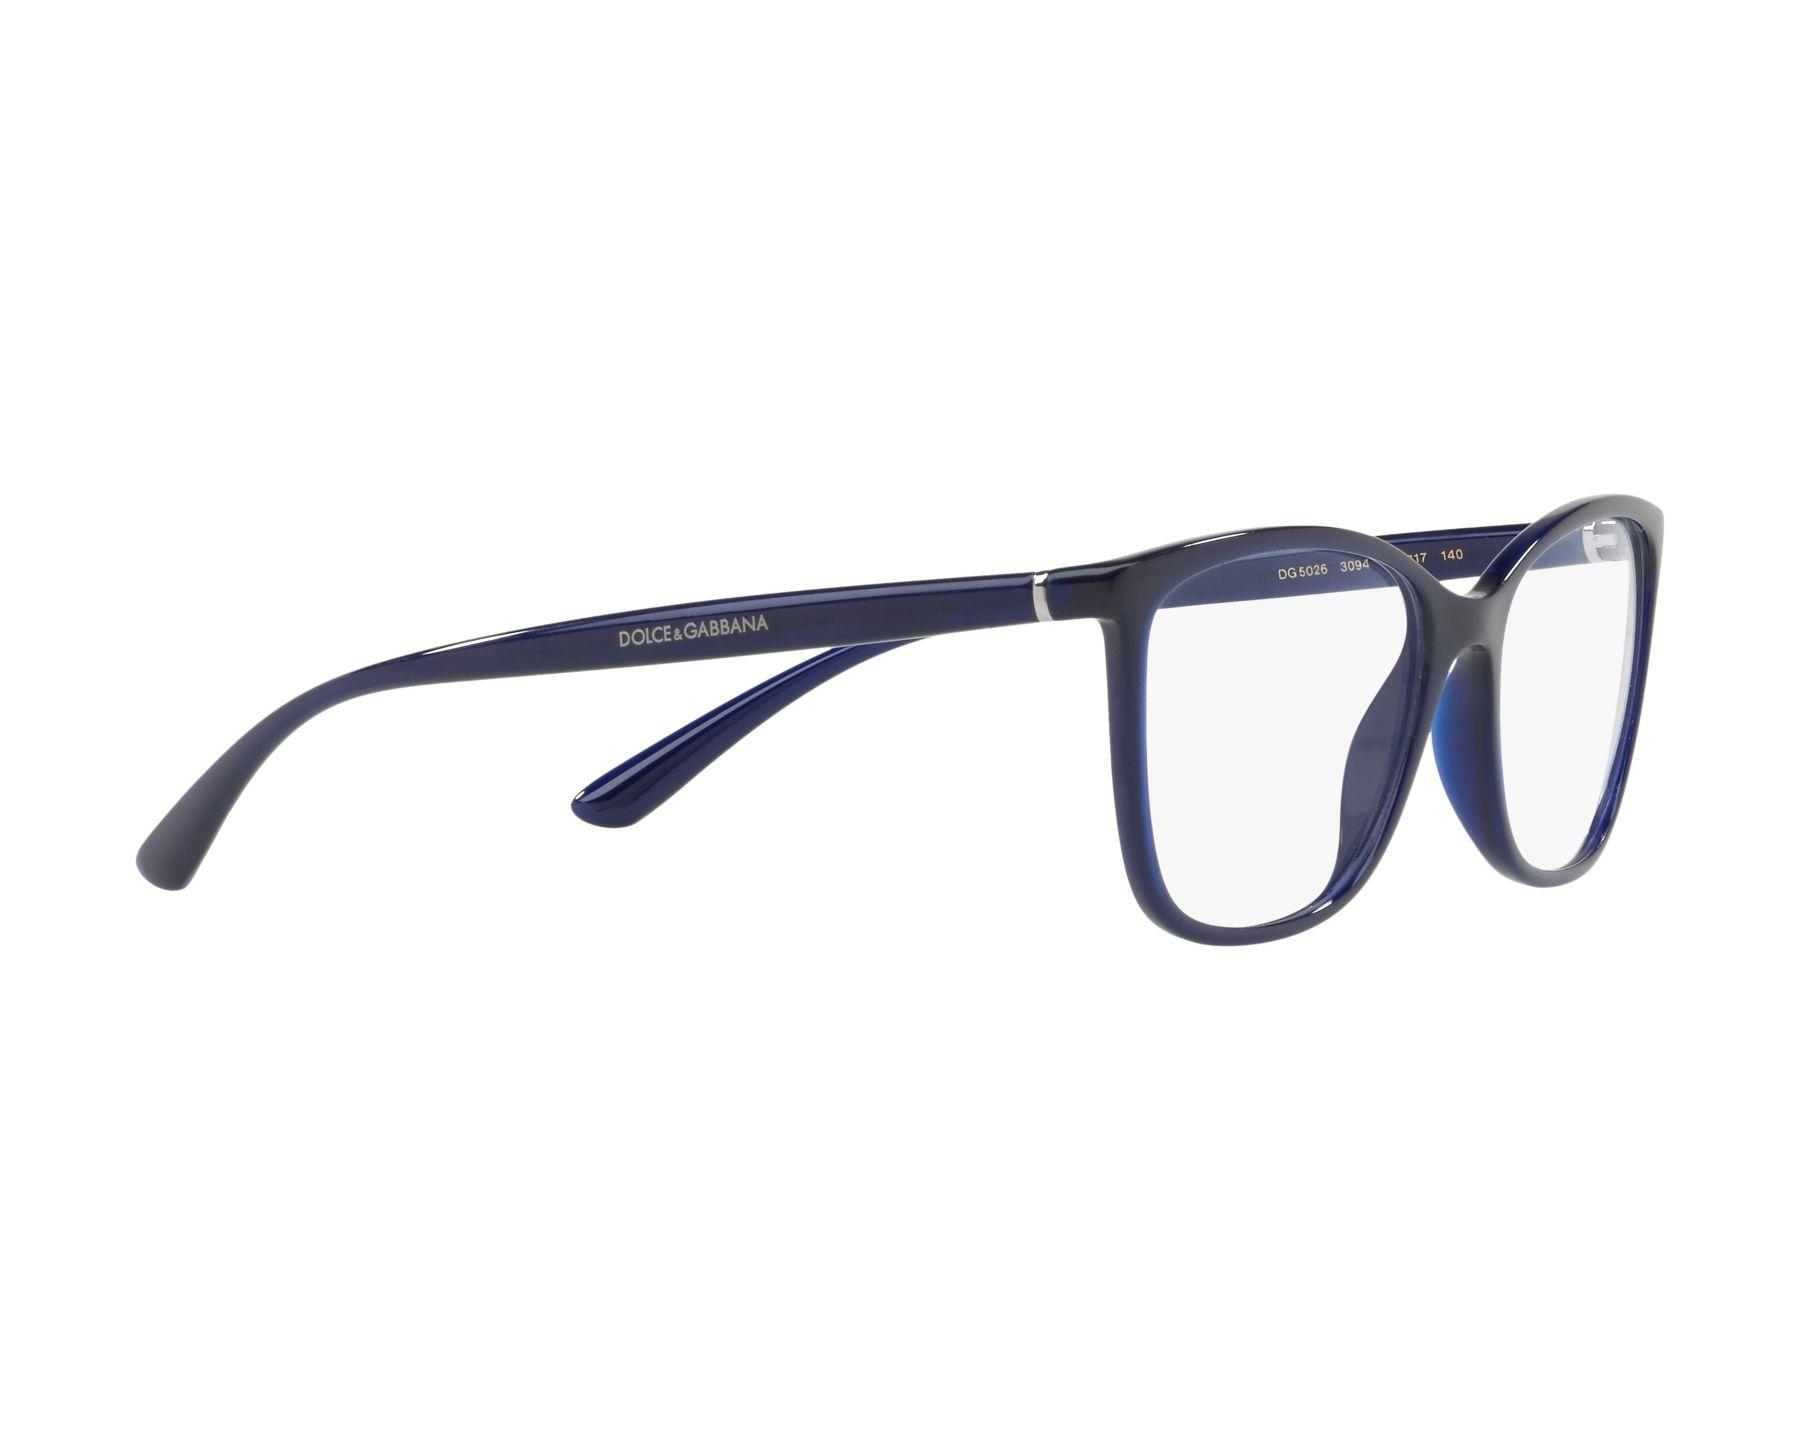 094c5f3c48d eyeglasses Dolce   Gabbana DG-5026 3094 54-17 Blue 360 degree view 11